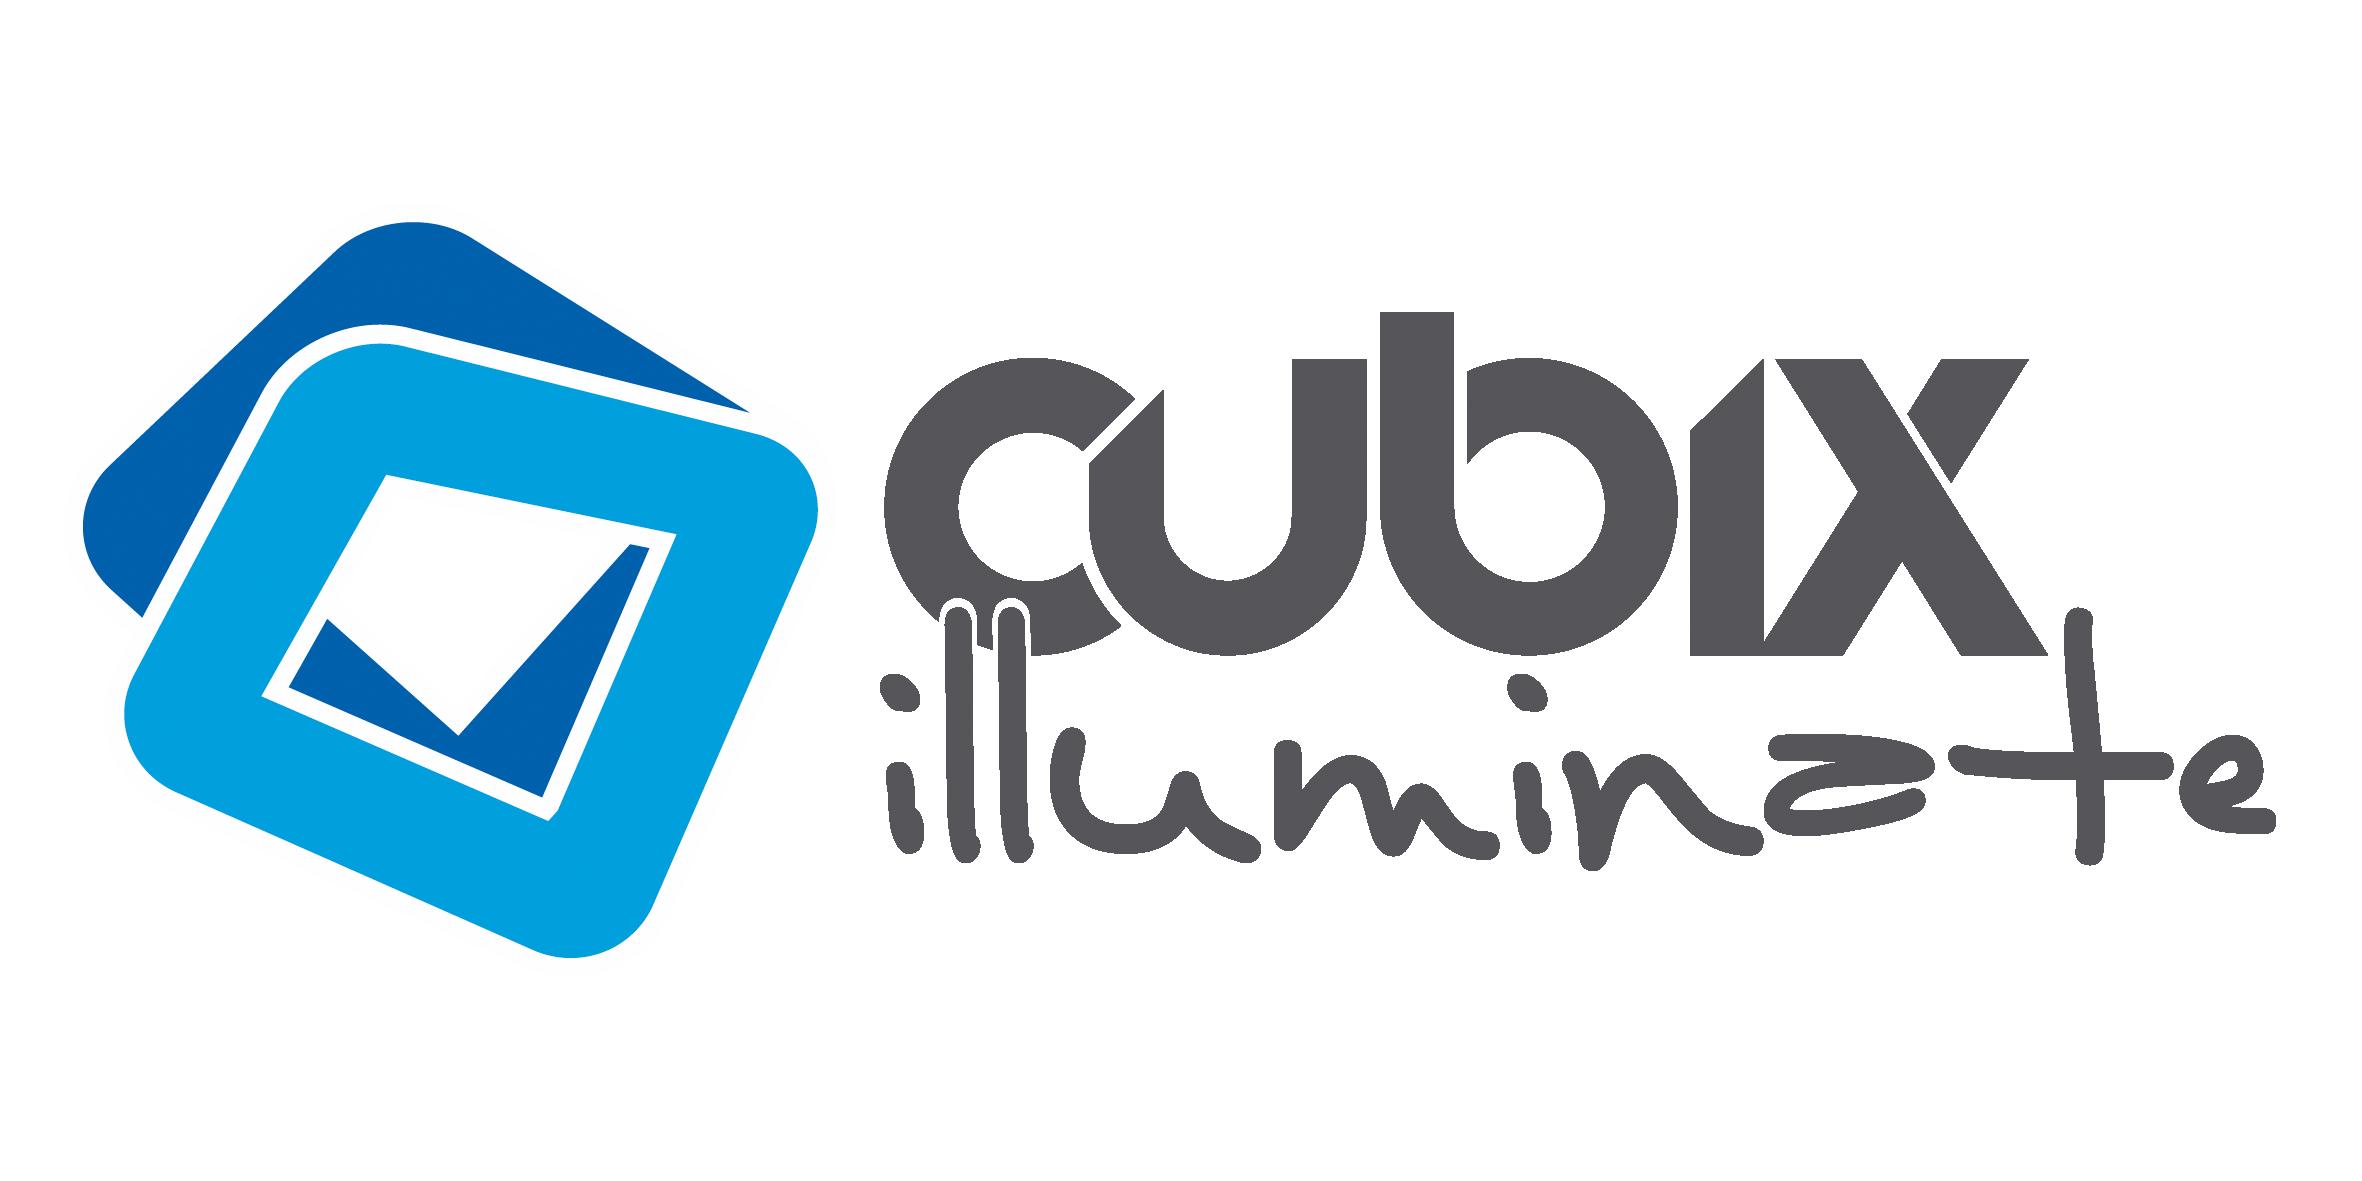 3 CUBIX illuminate-LOGO-RGB